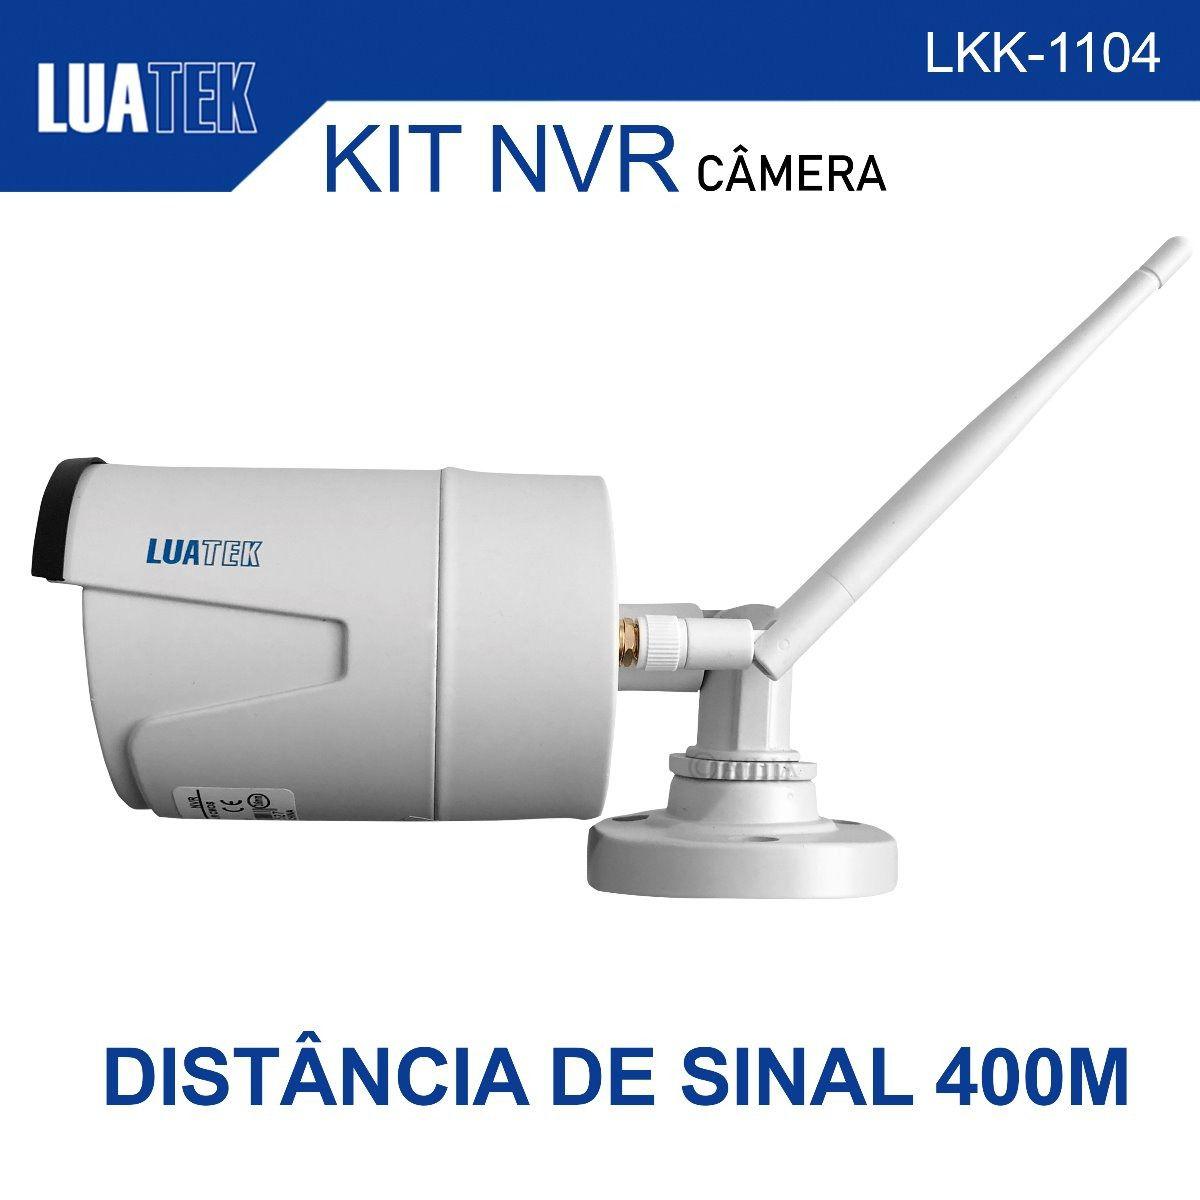 Kit 4 Câmeras sem fio WI-FI HD LKK-1104 Luatek  - Wtech vendas e Assistência técnica